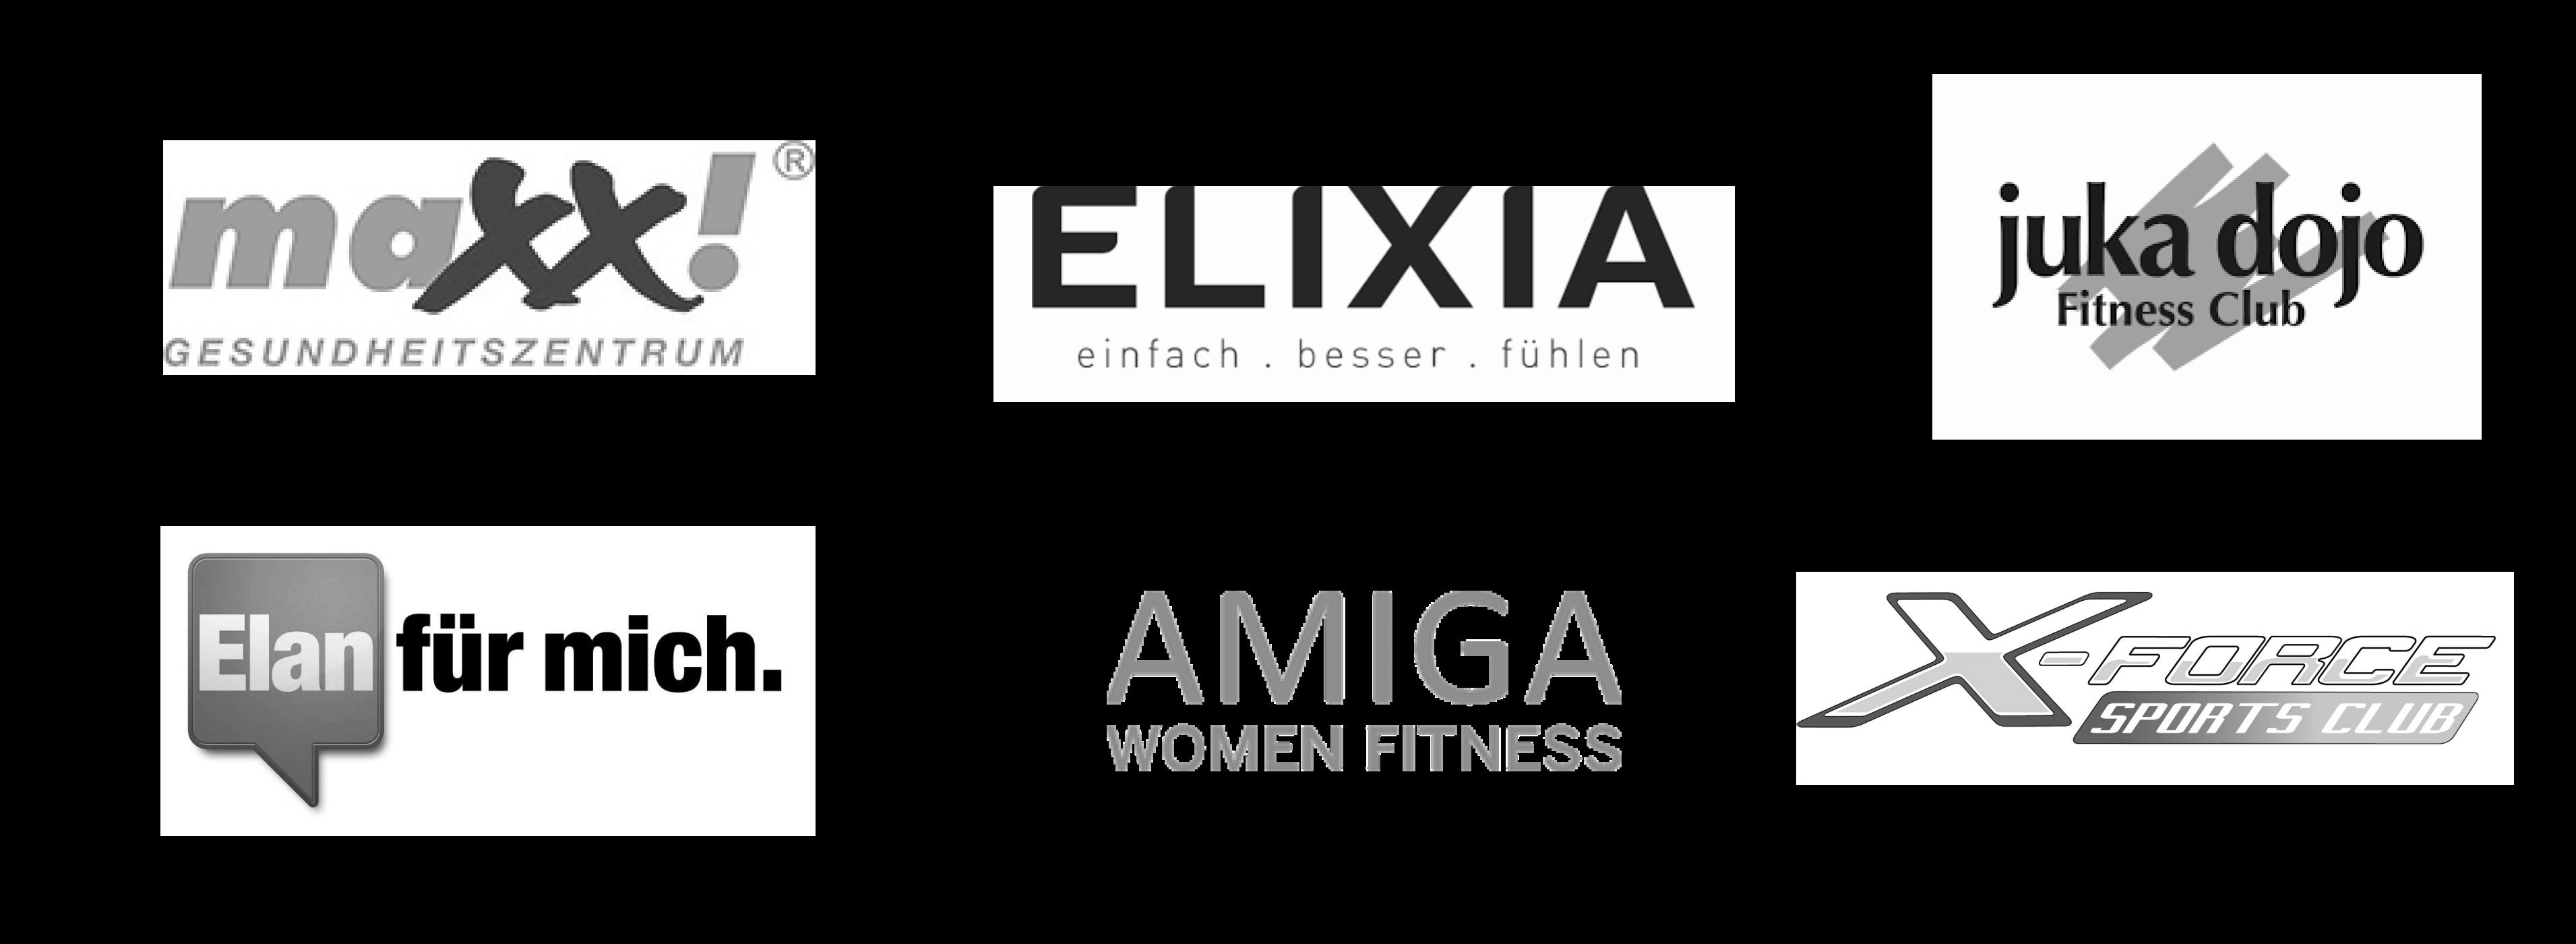 myFitApp Branded Member App Kunden maxx!, ELIXIA, juka dojo, ELAN für mich, Amiga, x-Force Sports Club